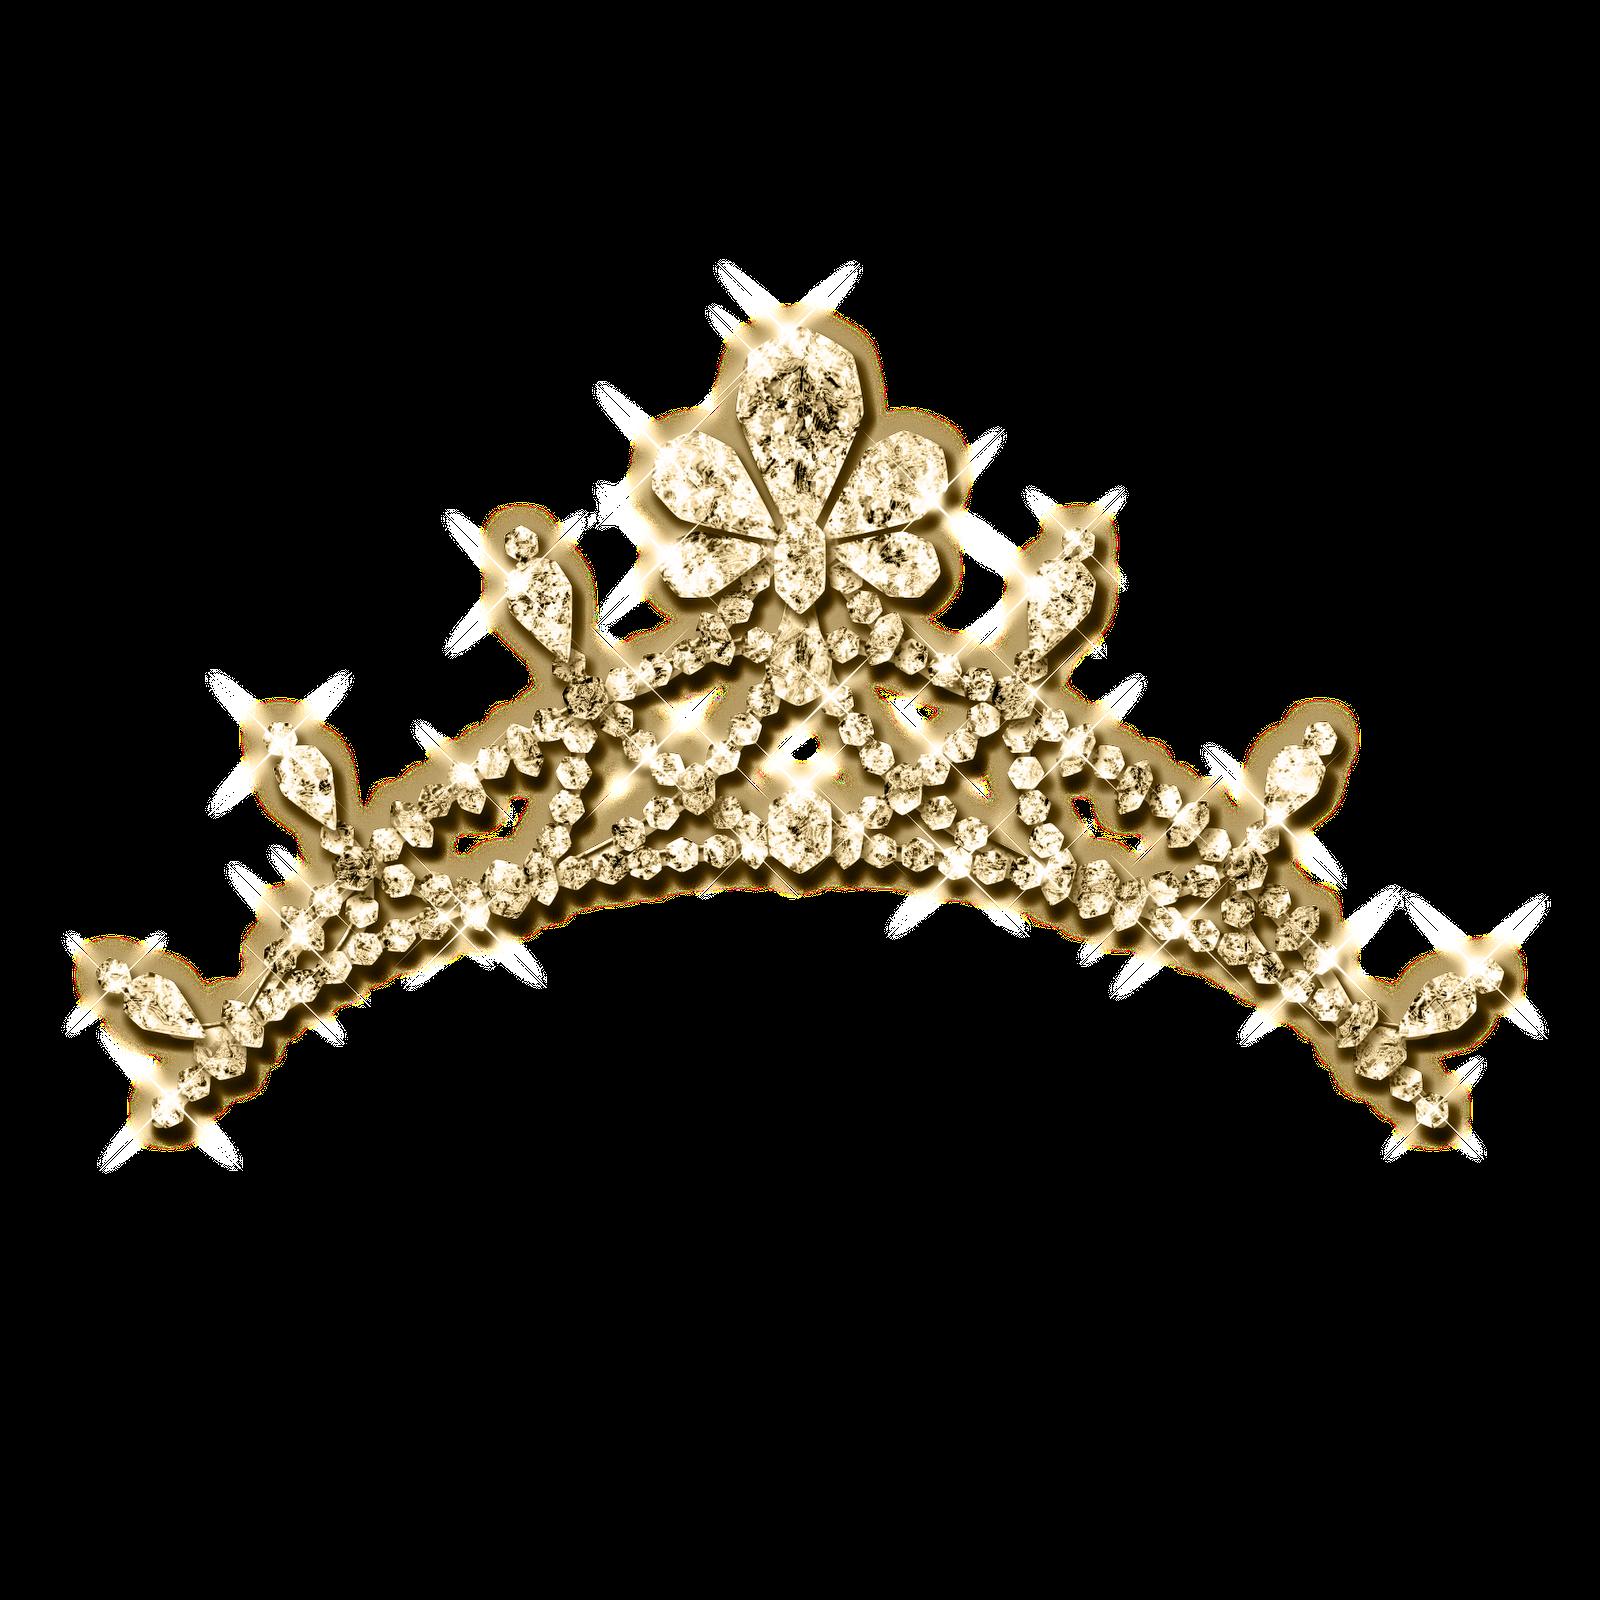 diamond tiara clip art - photo #45